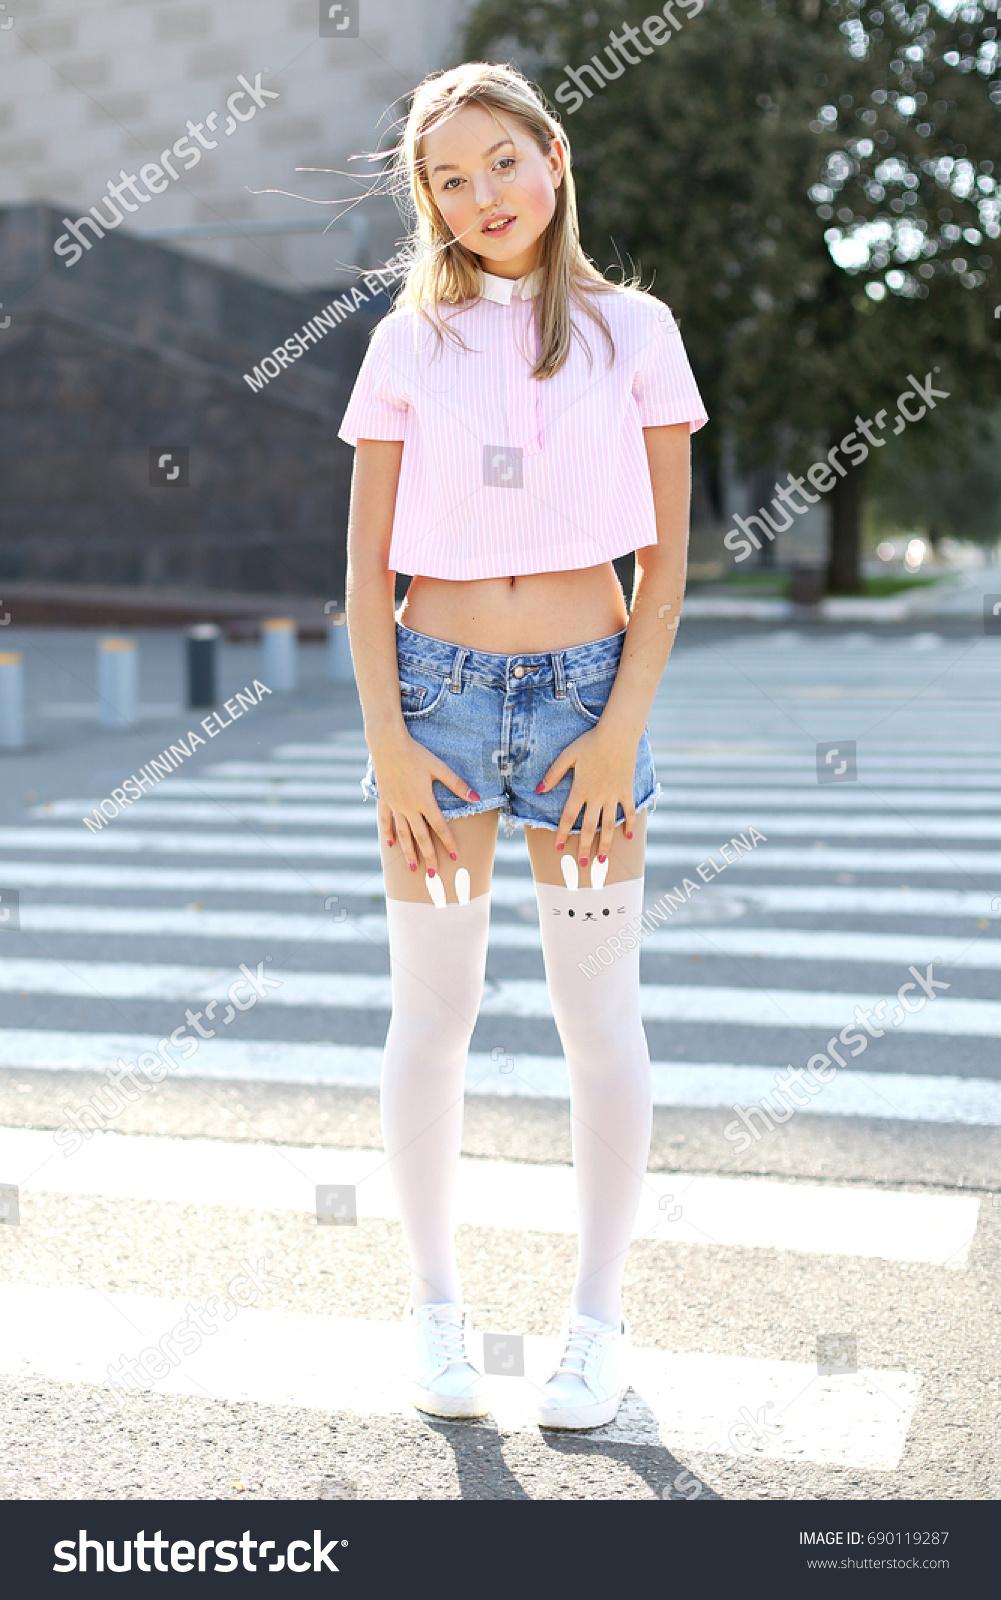 That Young teen girls socks